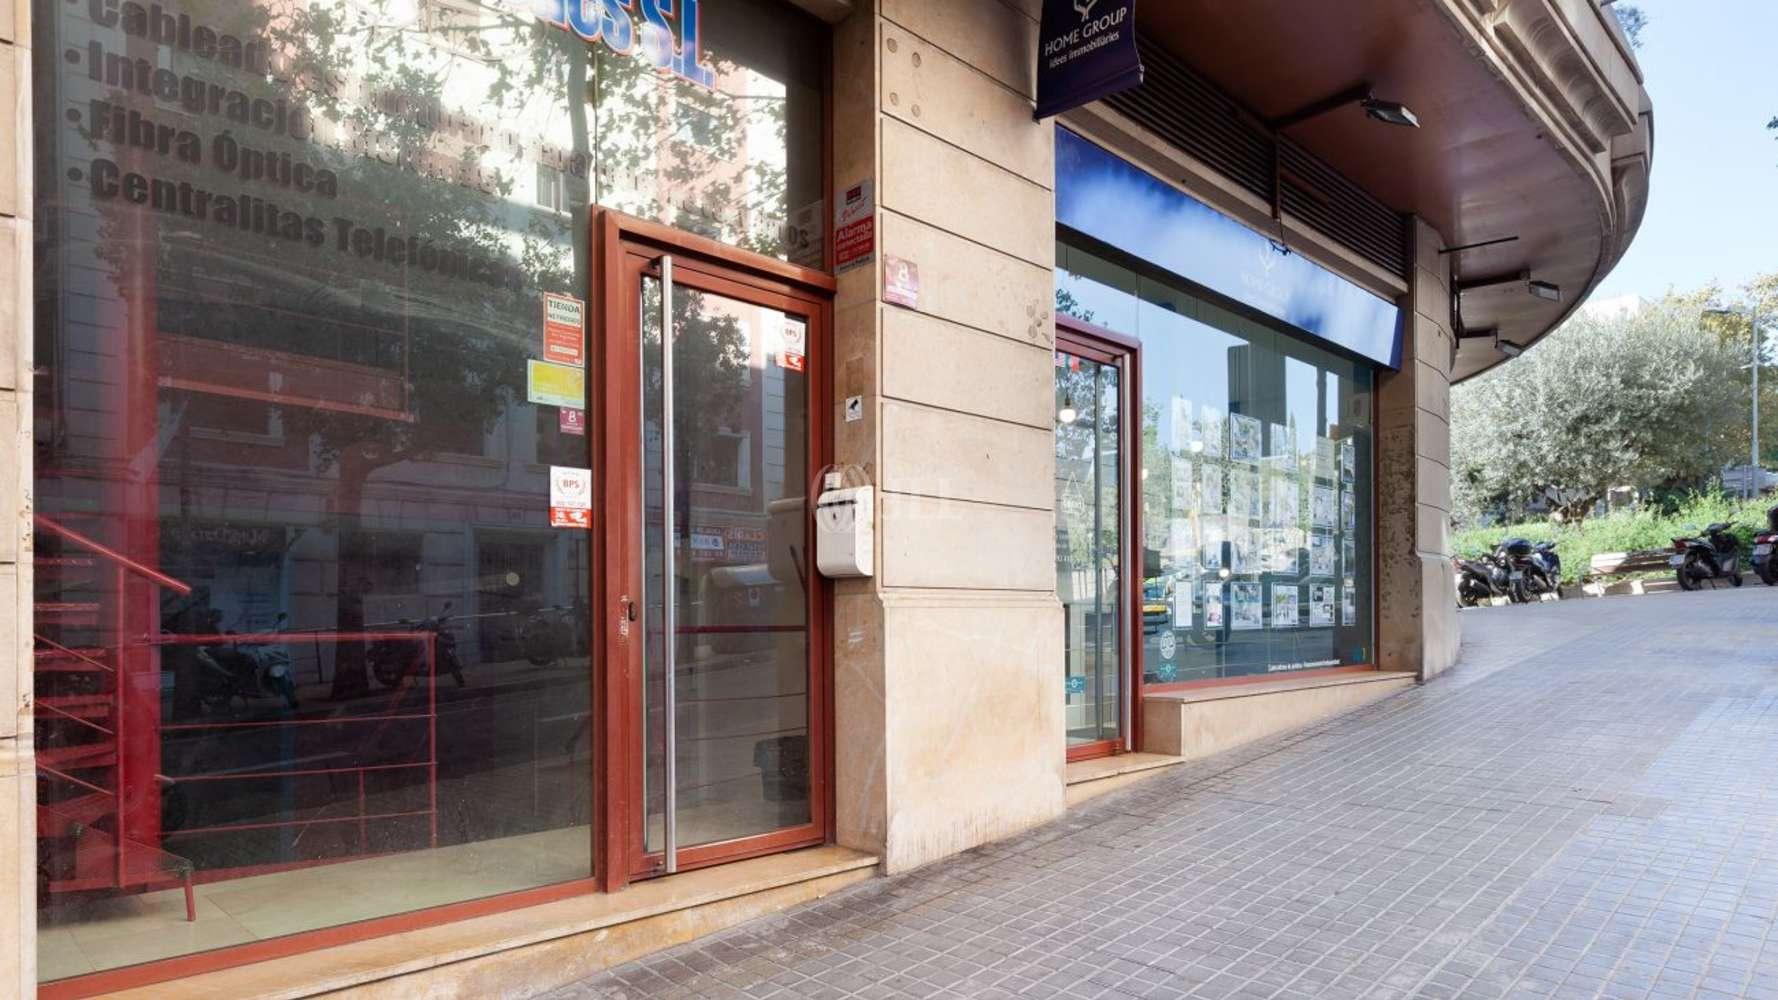 Local comercial Barcelona, 08022 - SANT GERVASI 90